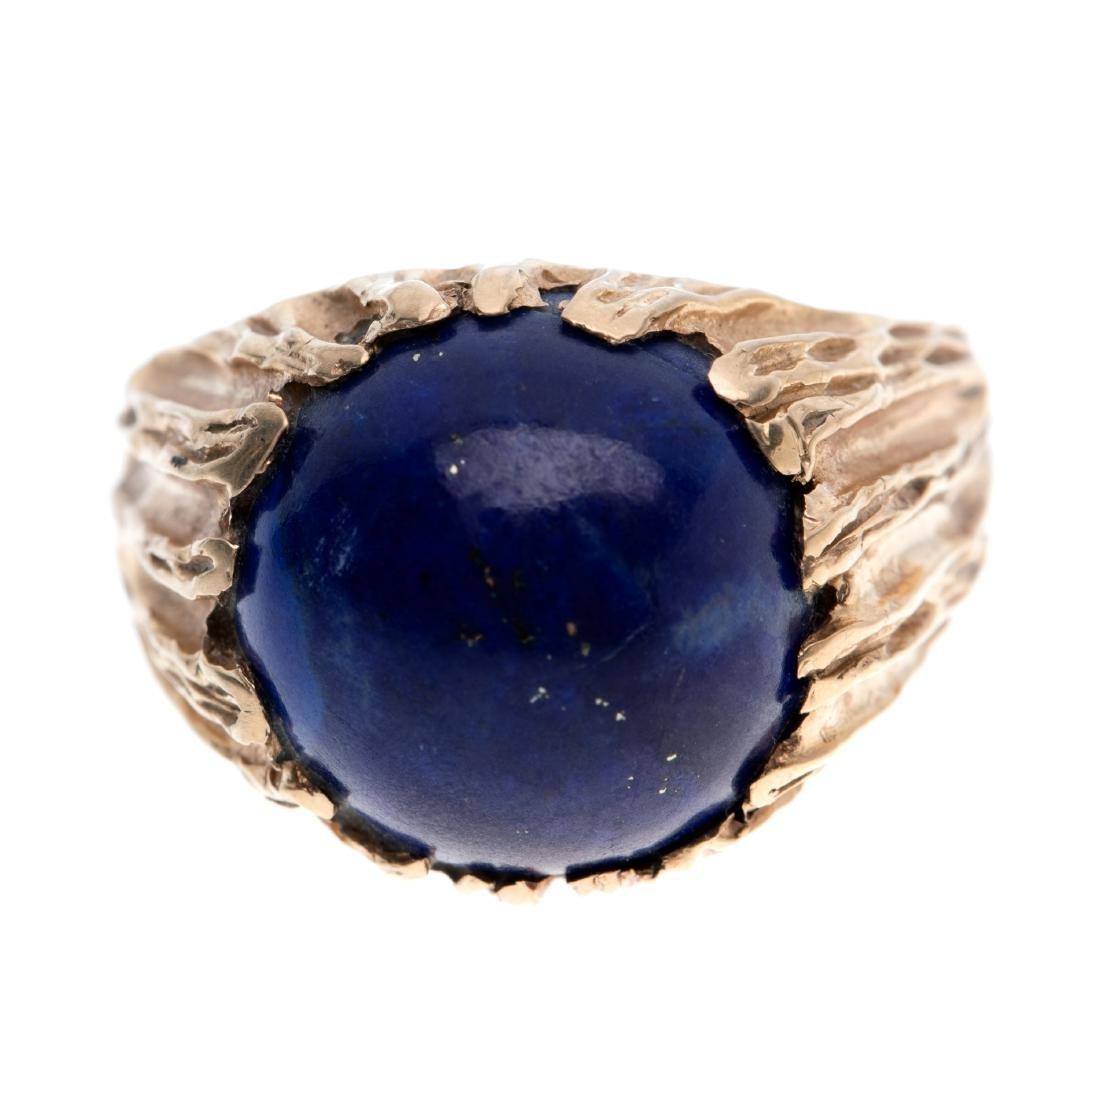 A gent's lapis lazuli, 14k ring - 4